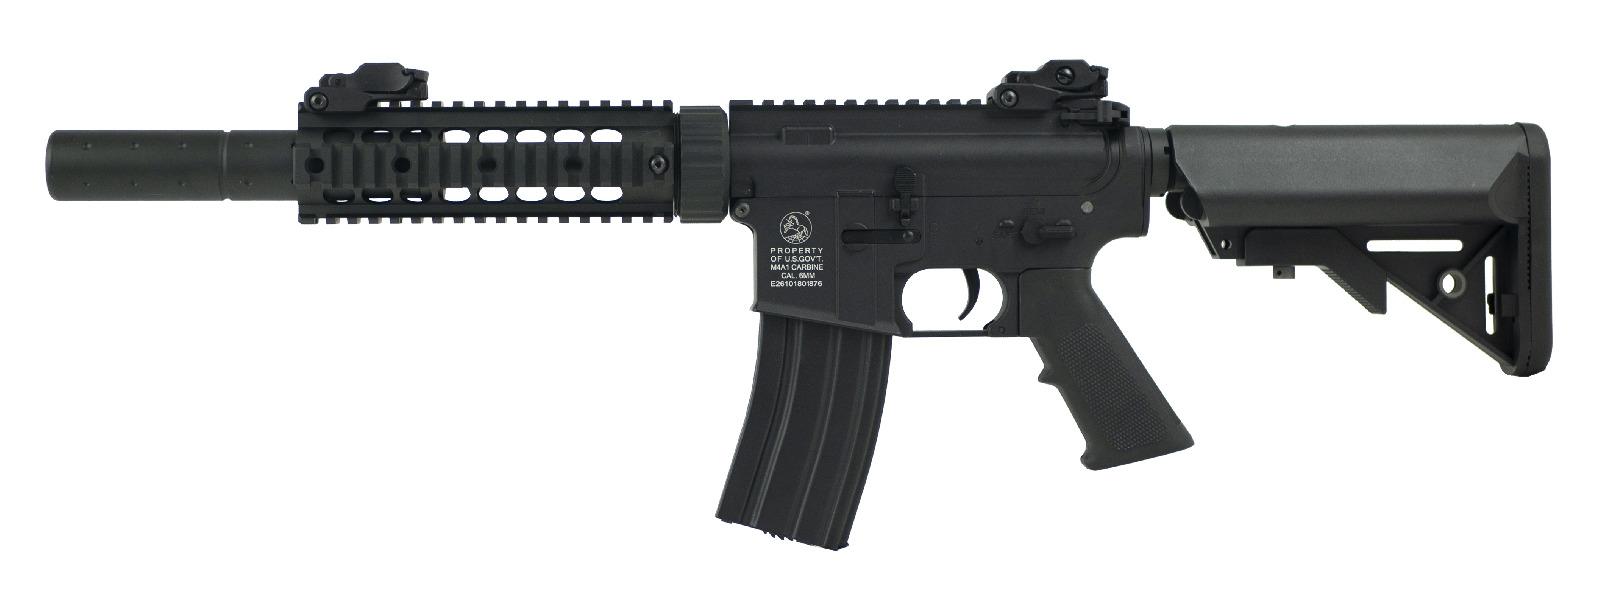 Colt M4 Silent ops Black full metal product image